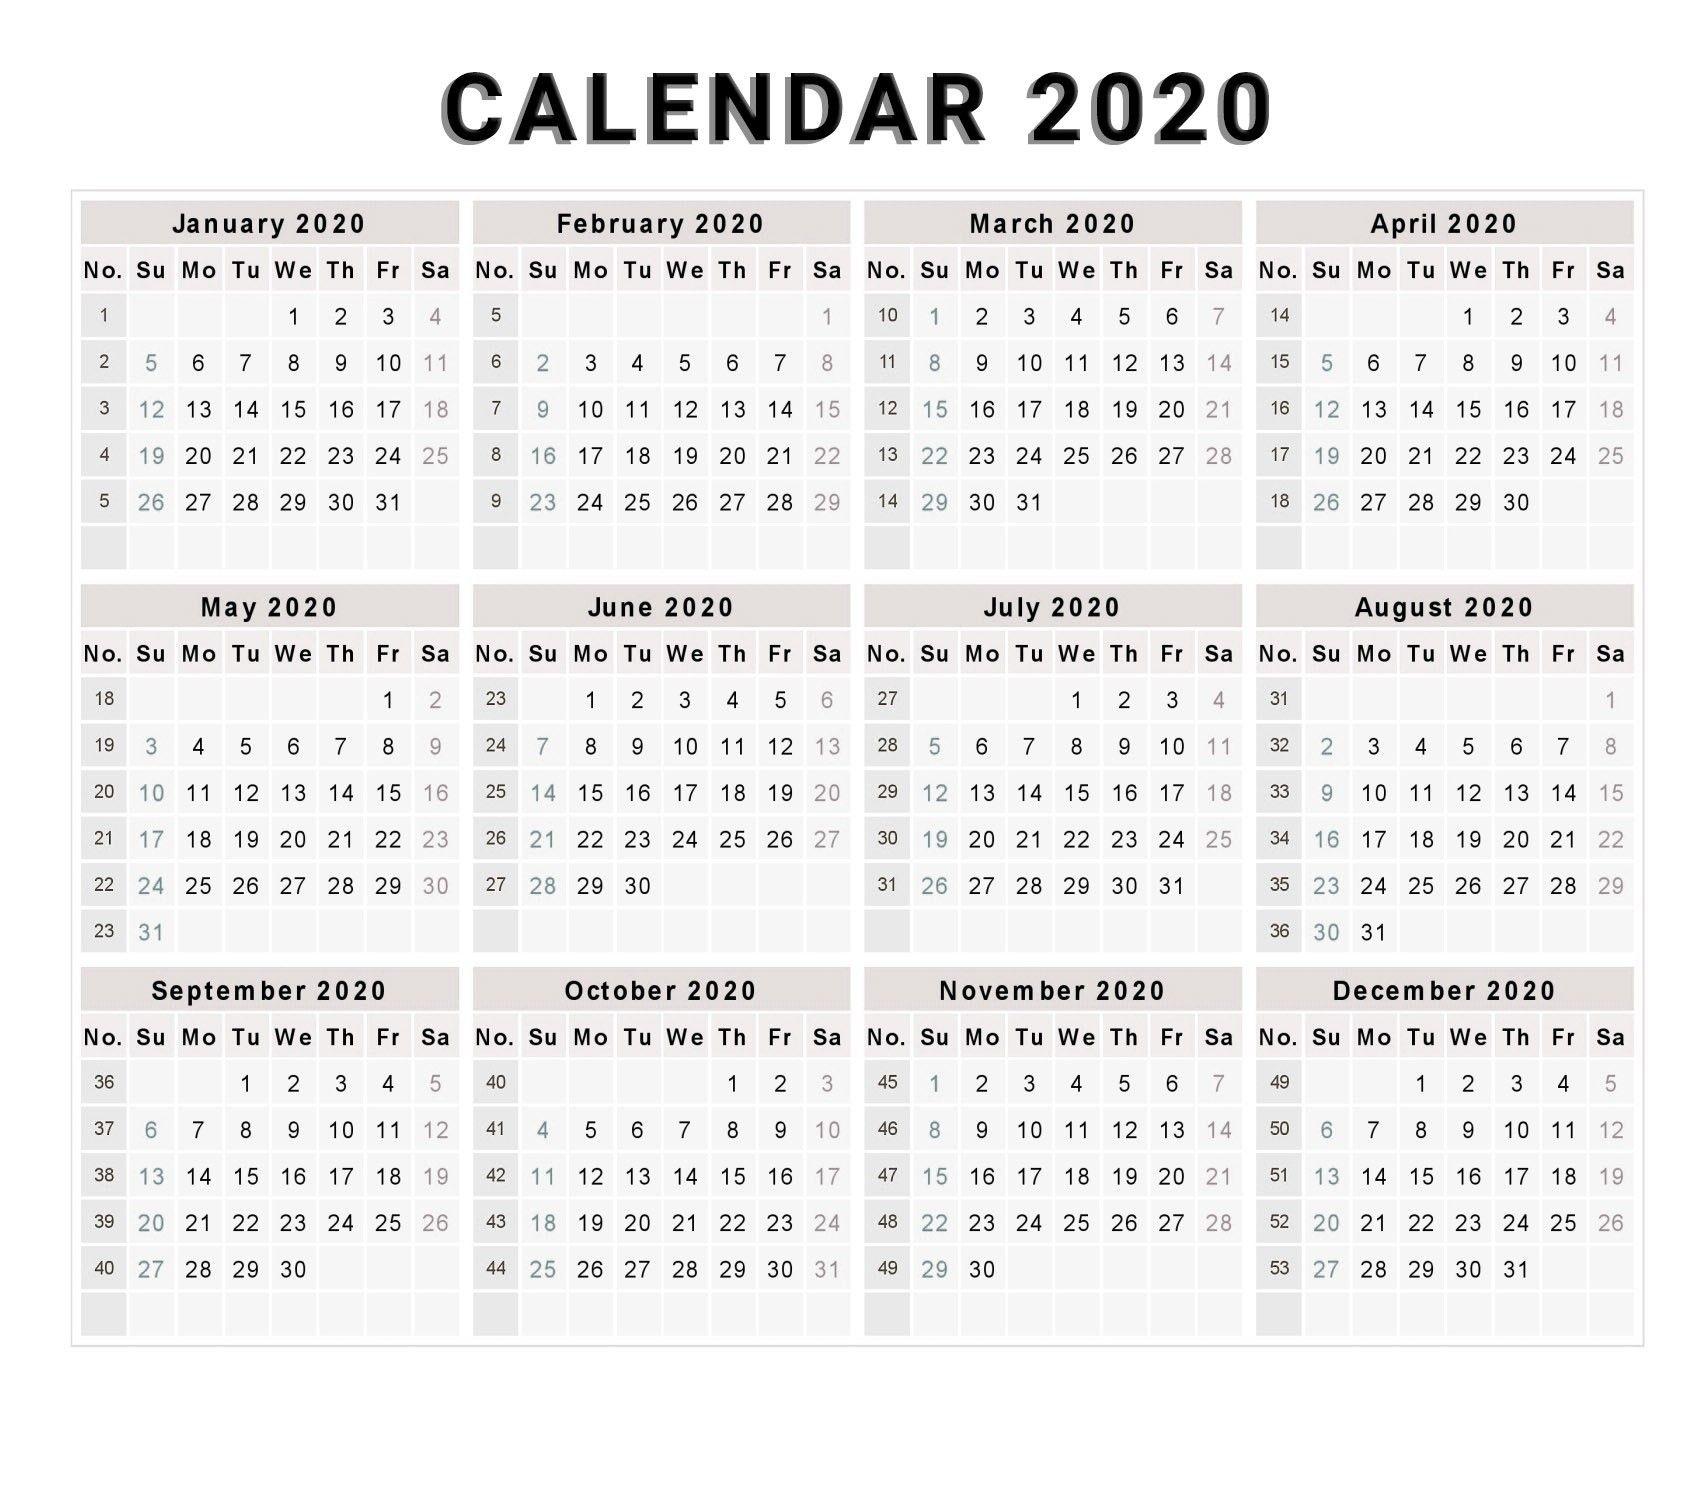 Calendar 2020 Free Printable Calendar 2020 Free 2020 regarding Free Printable Year At A Glance Calendars No Download 2020